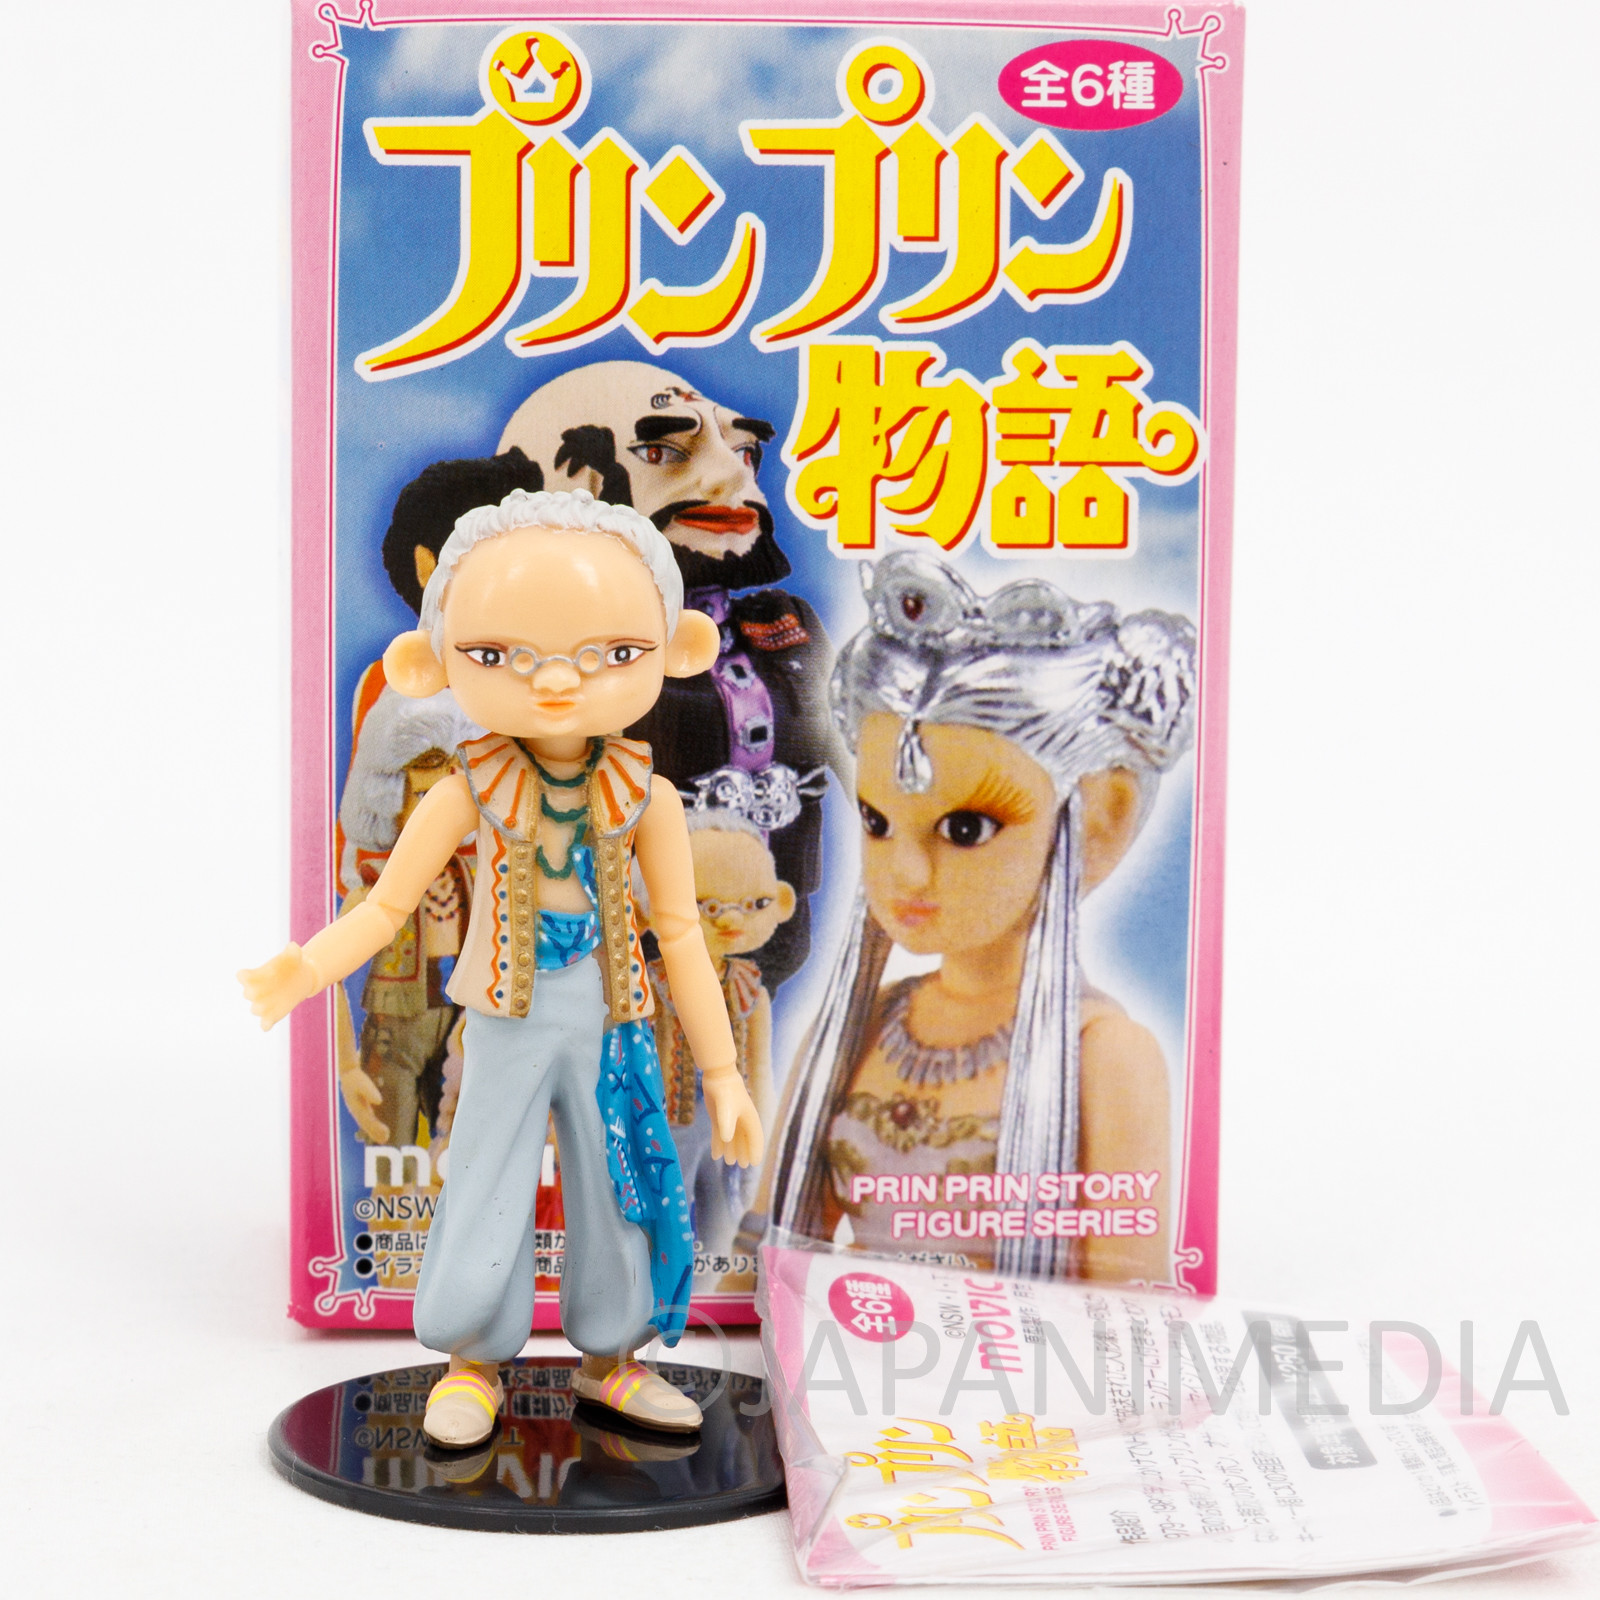 Purin Purin Monogatari Kaseijin Figure Puppet Show NHK TV JAPAN ANIME